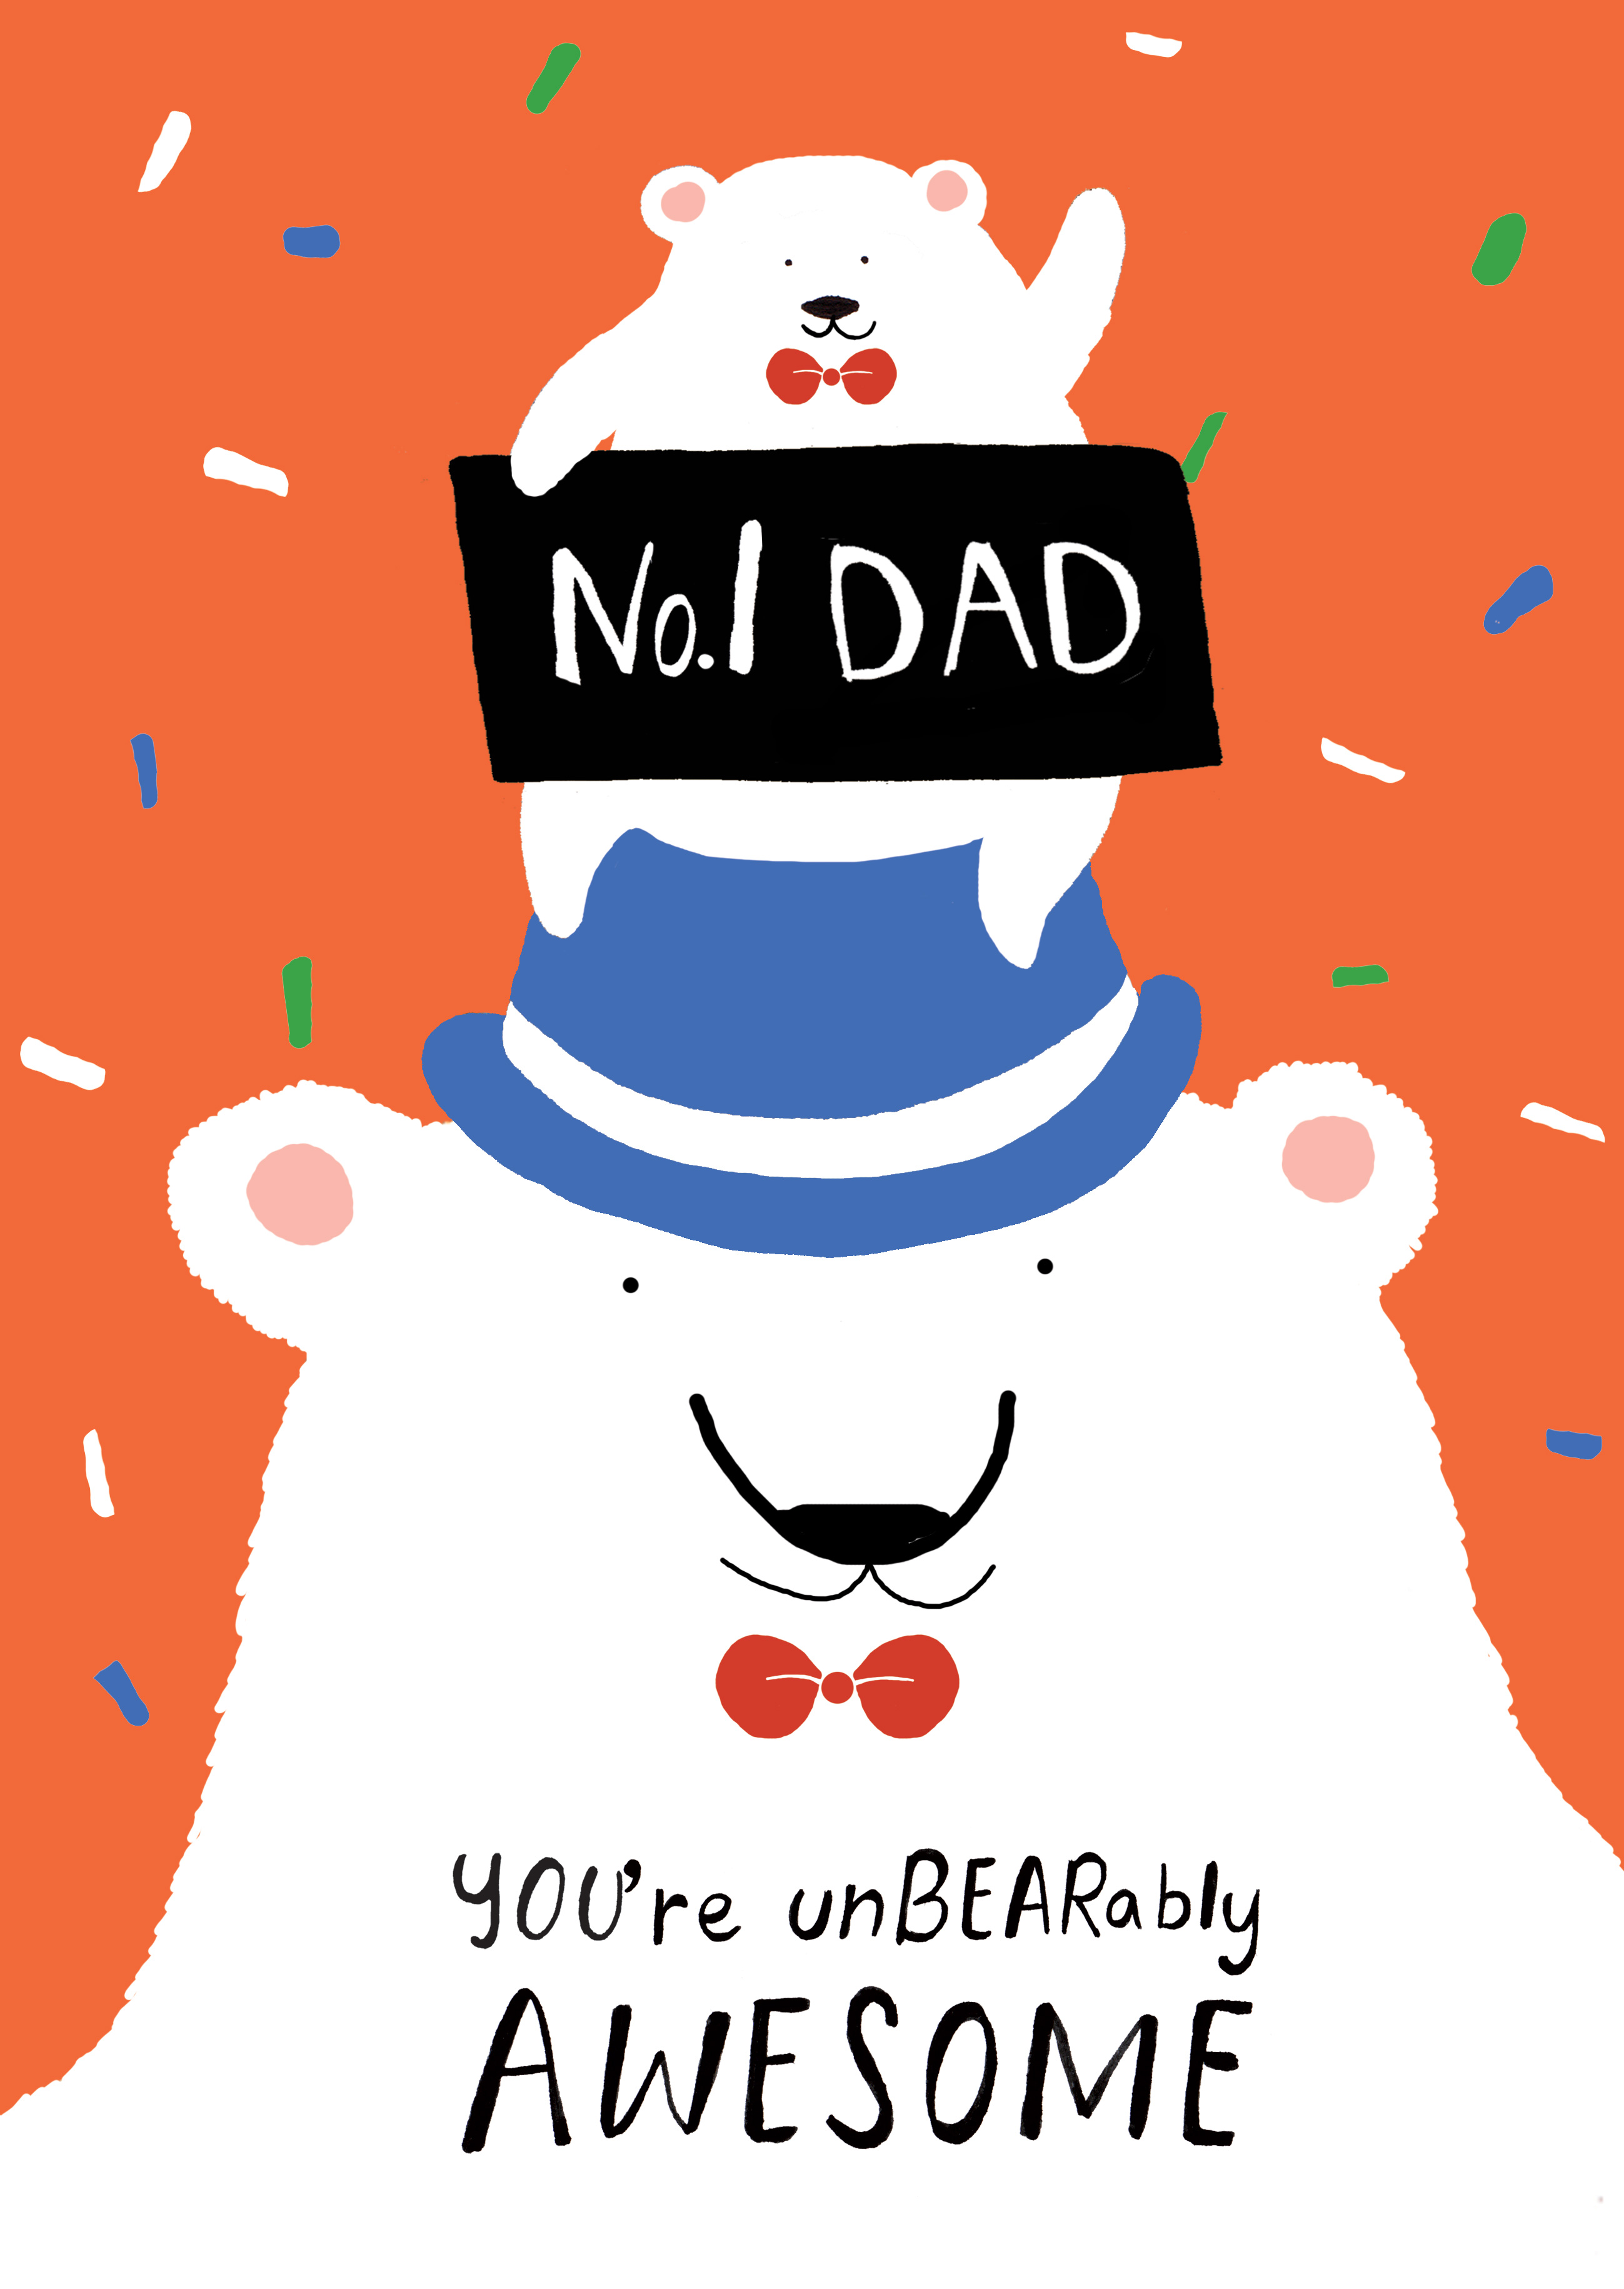 unbearably-awesome-happy-fathers-day-lulu-mayo